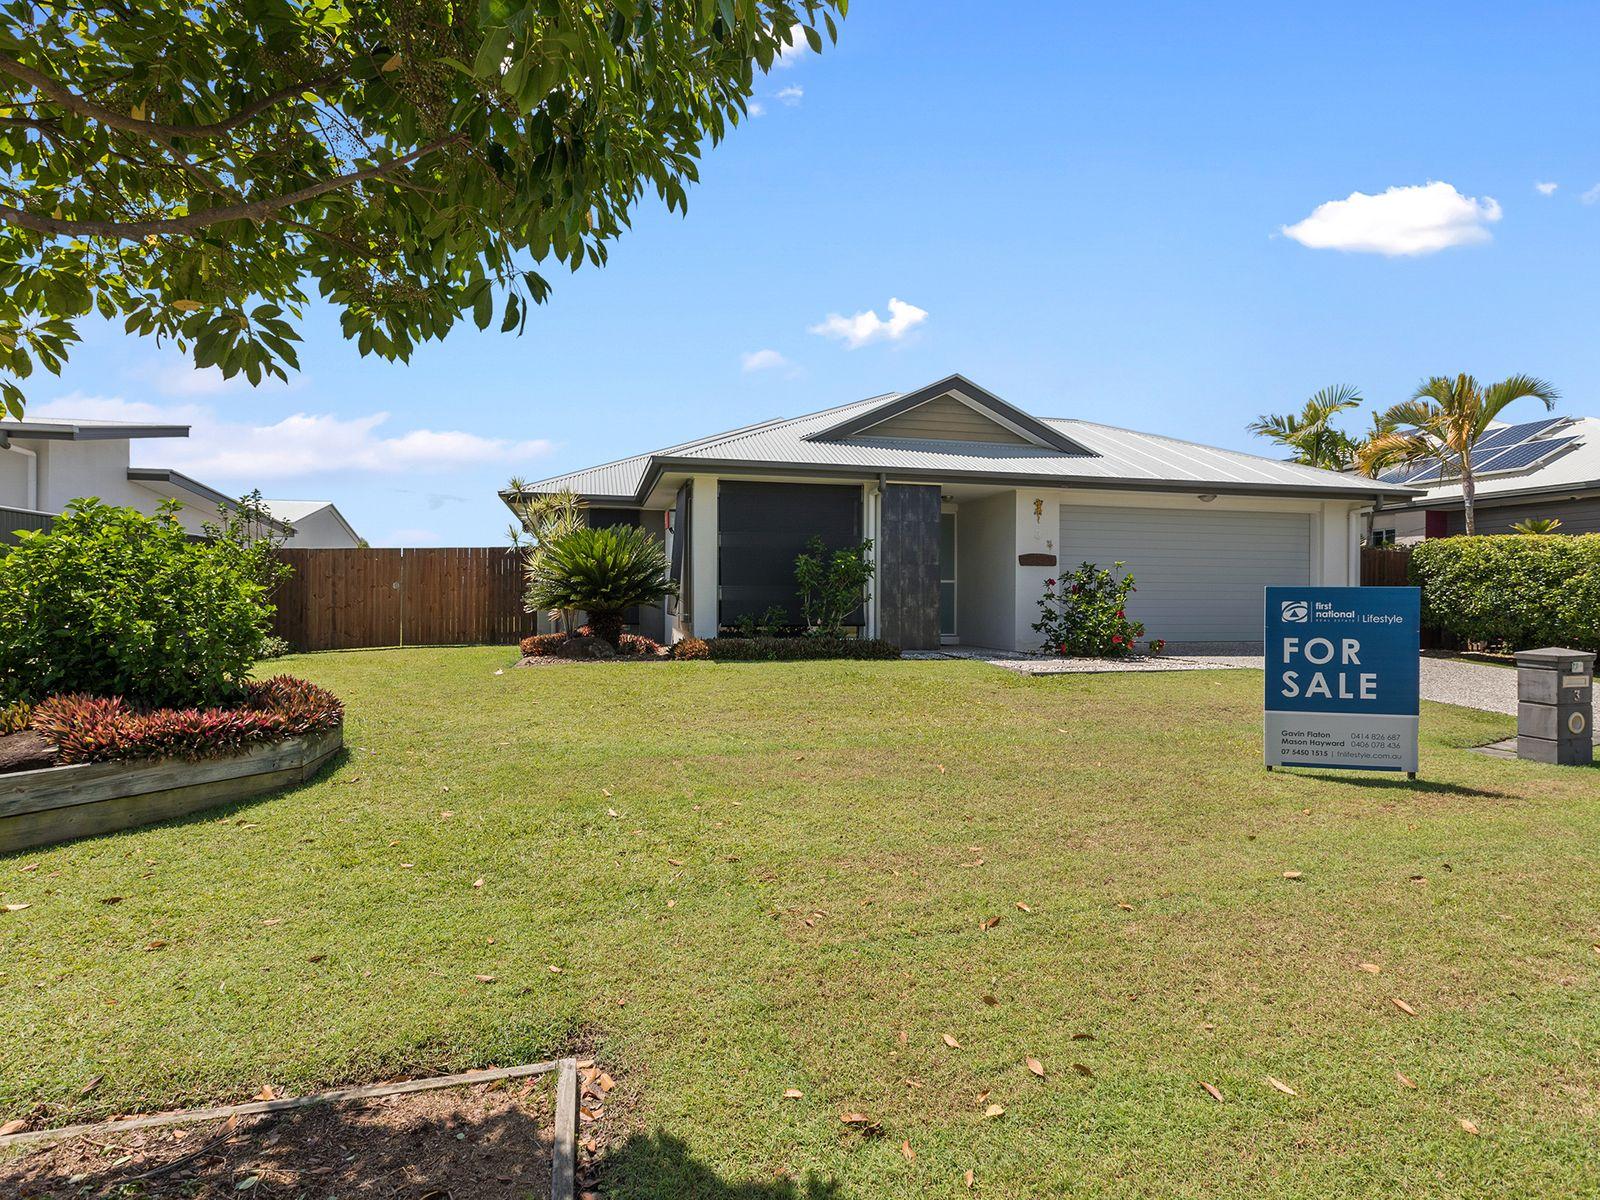 3 Kepplegrove Drive, Sippy Downs, QLD 4556